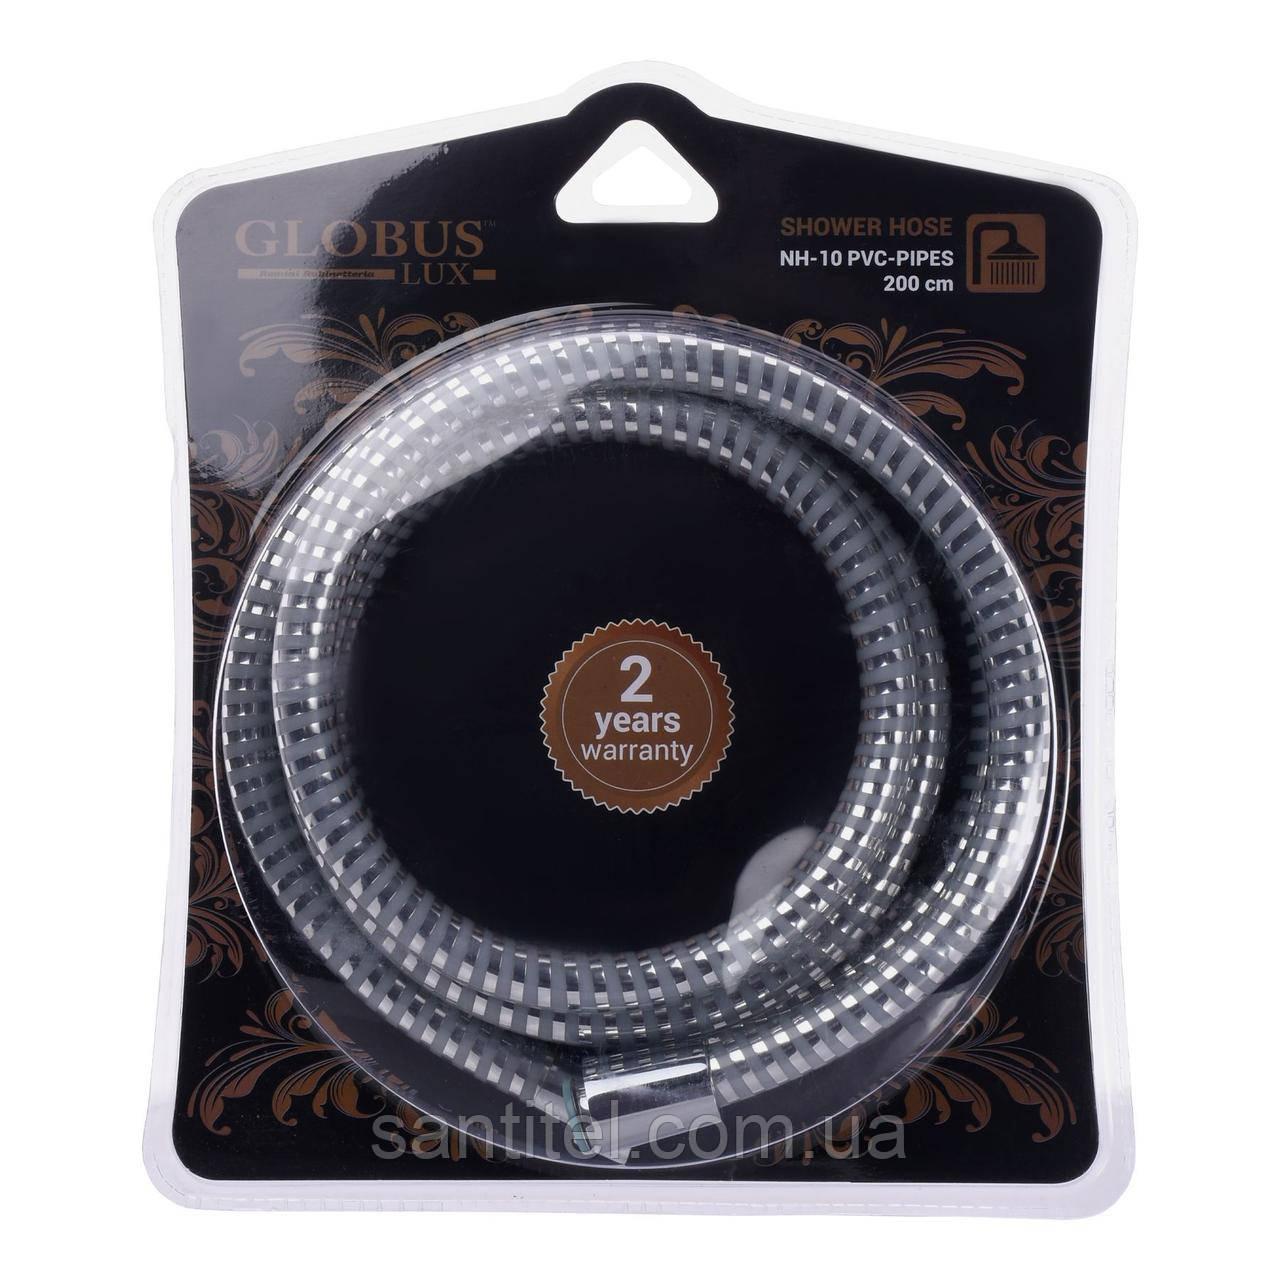 Душовий Шланг Globus Lux NH-10-200 PVC-PIPES